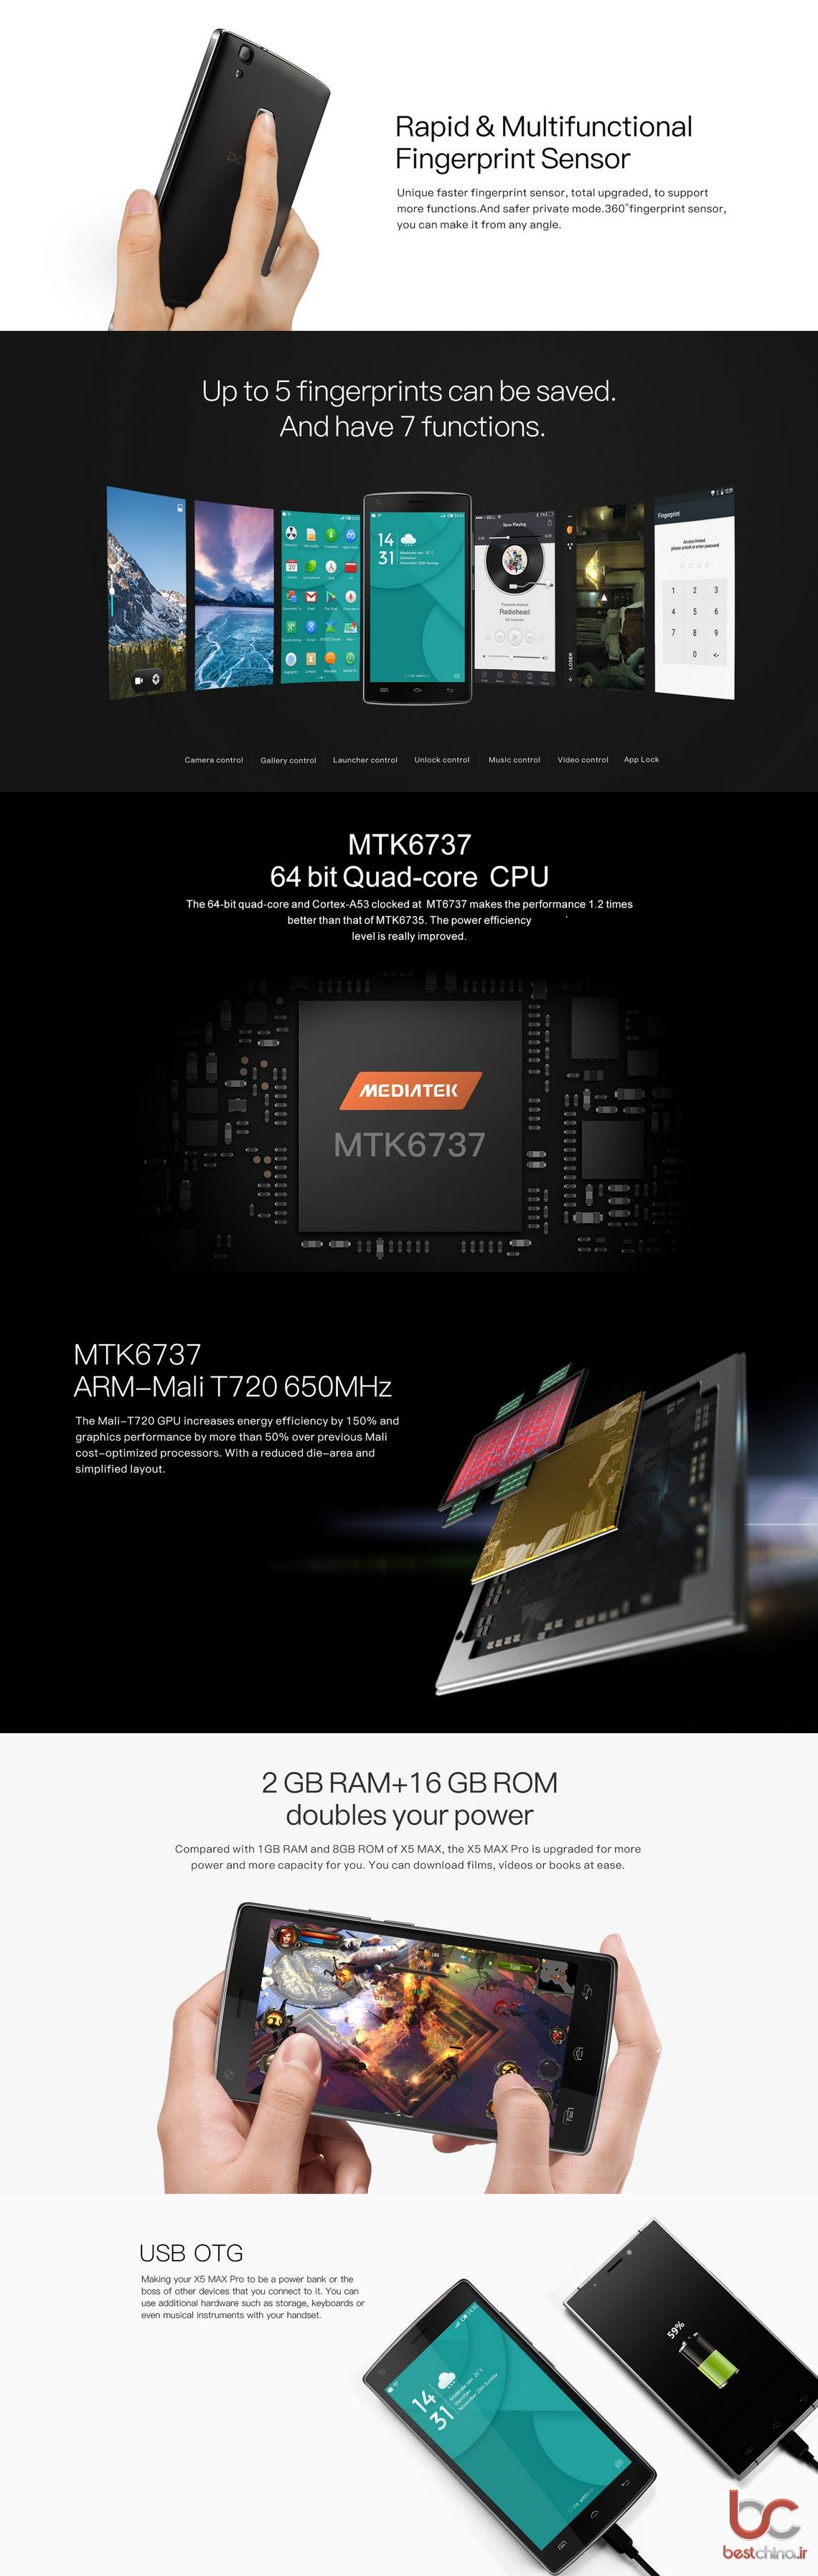 DOOGEE X5 Max Pro (2)